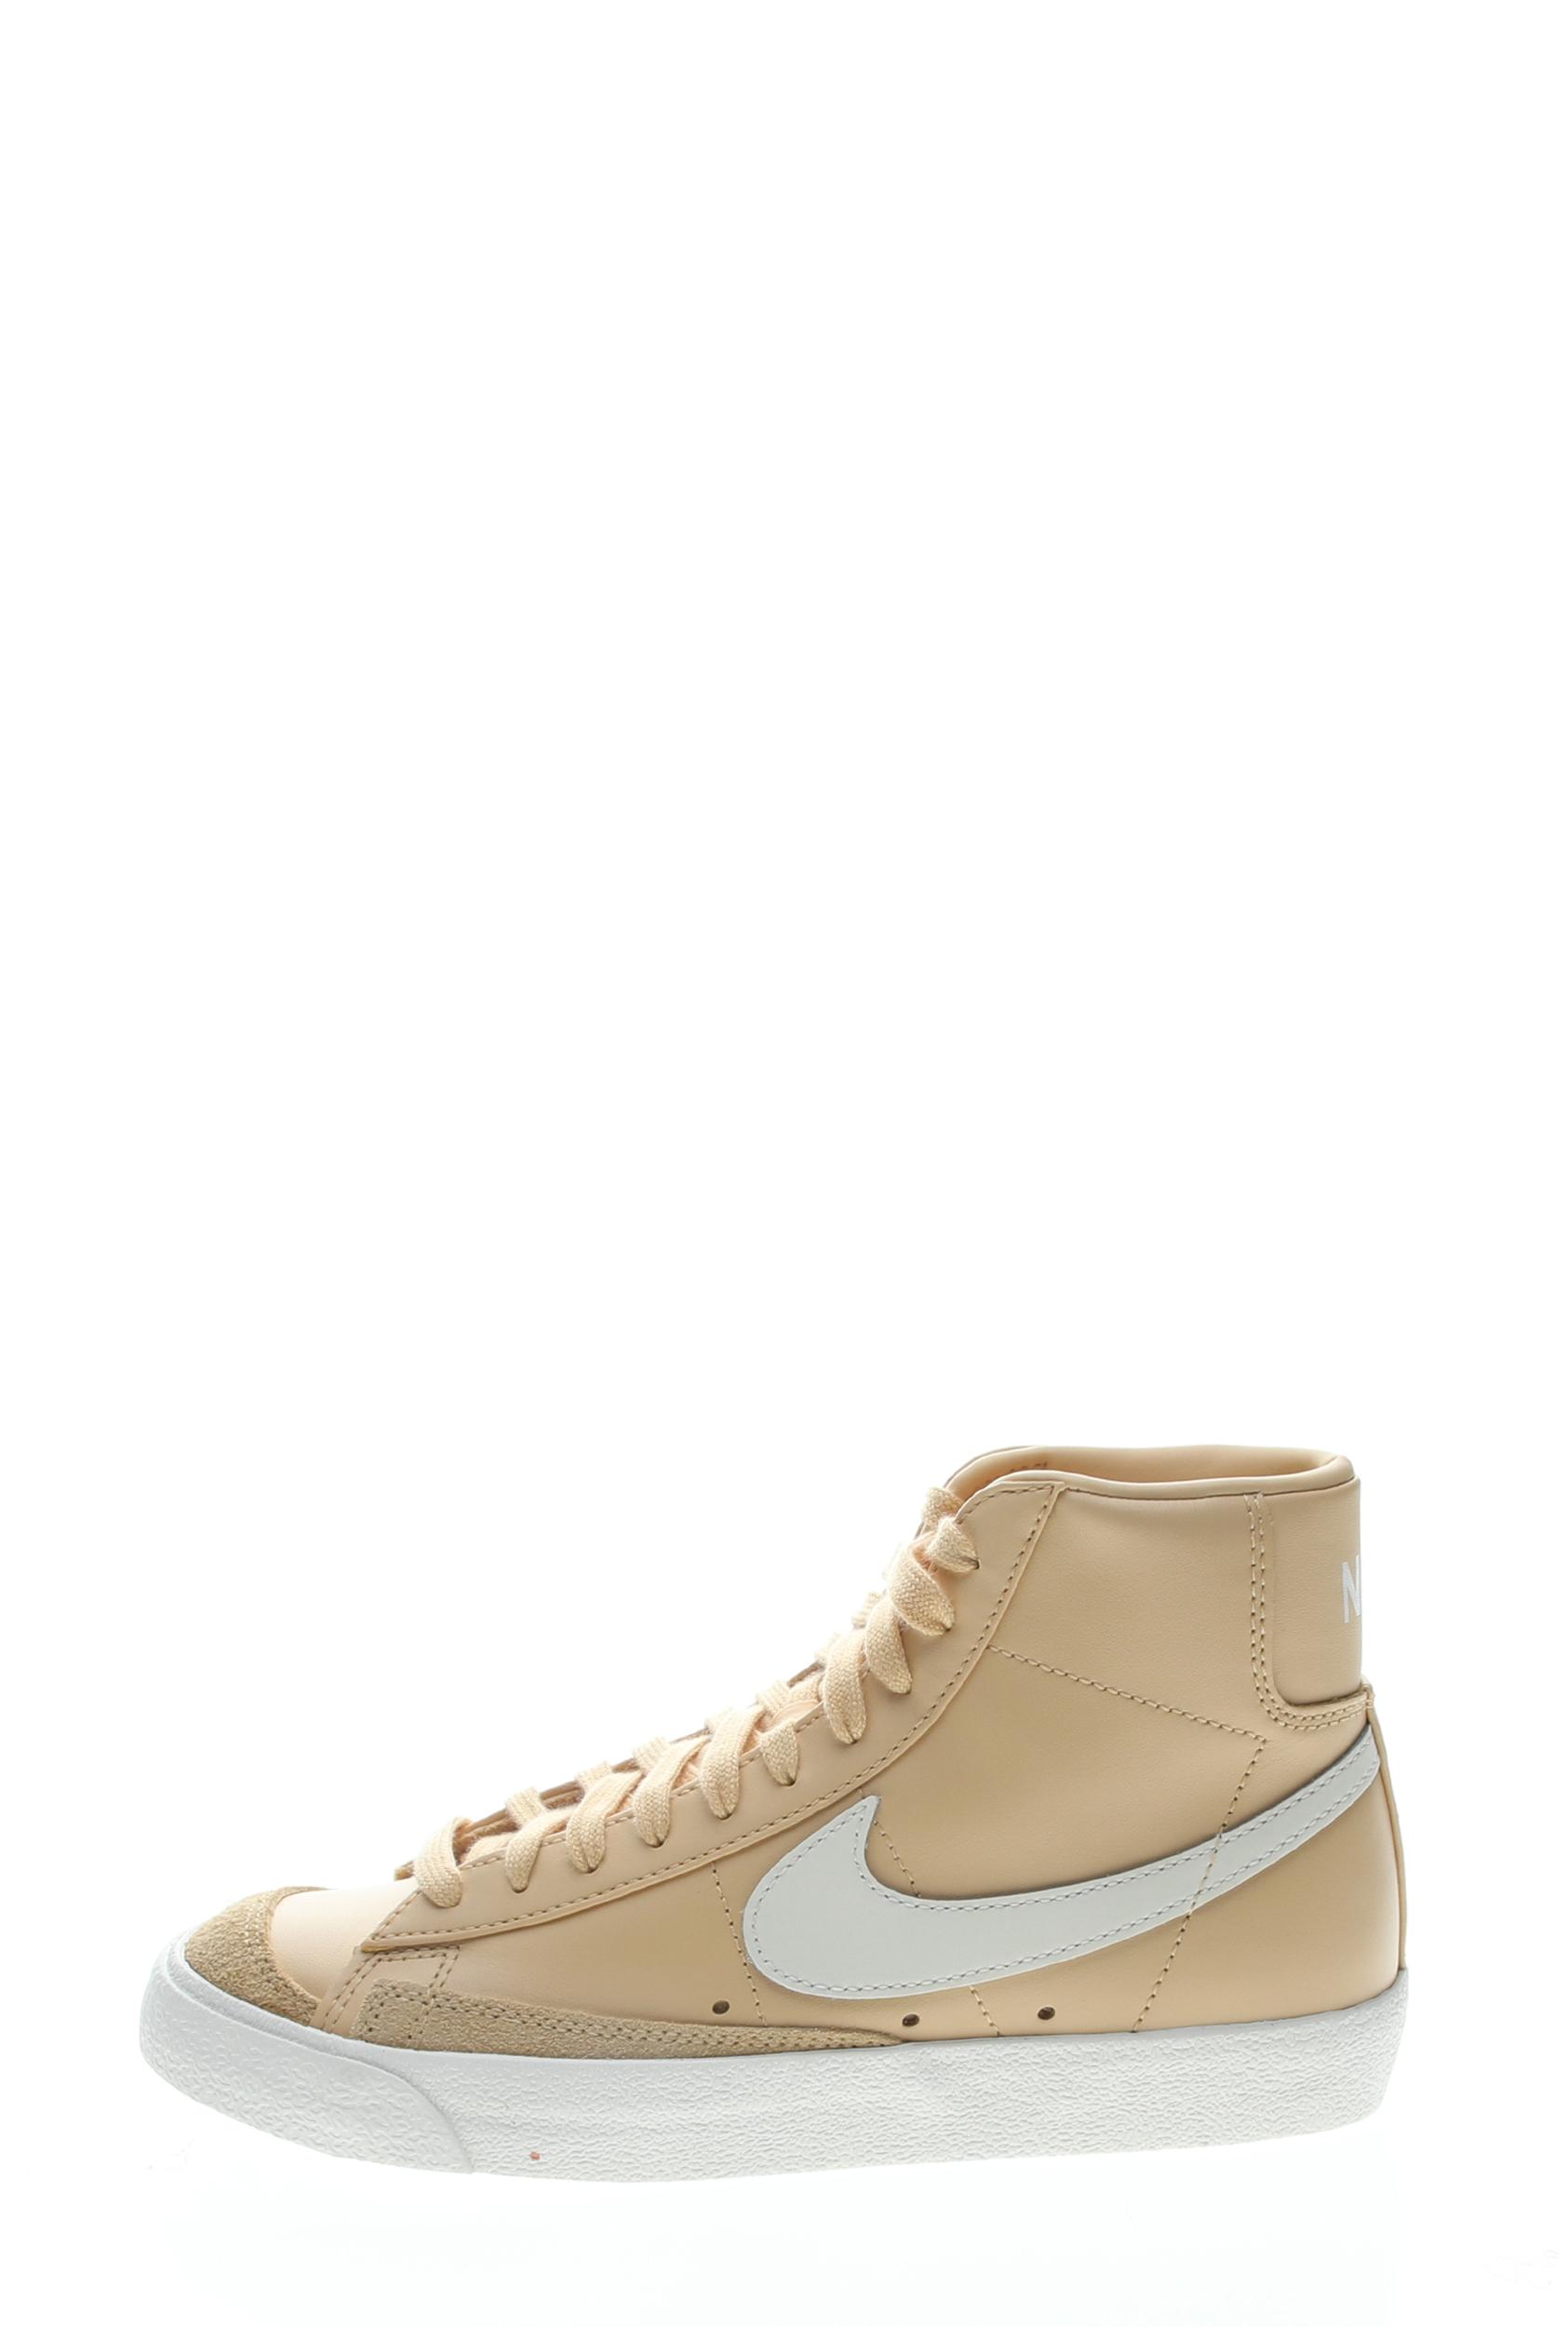 NIKE – Γυναικεία αθλητικά παπούτσια NIKE BLAZER MID '77 μπεζ